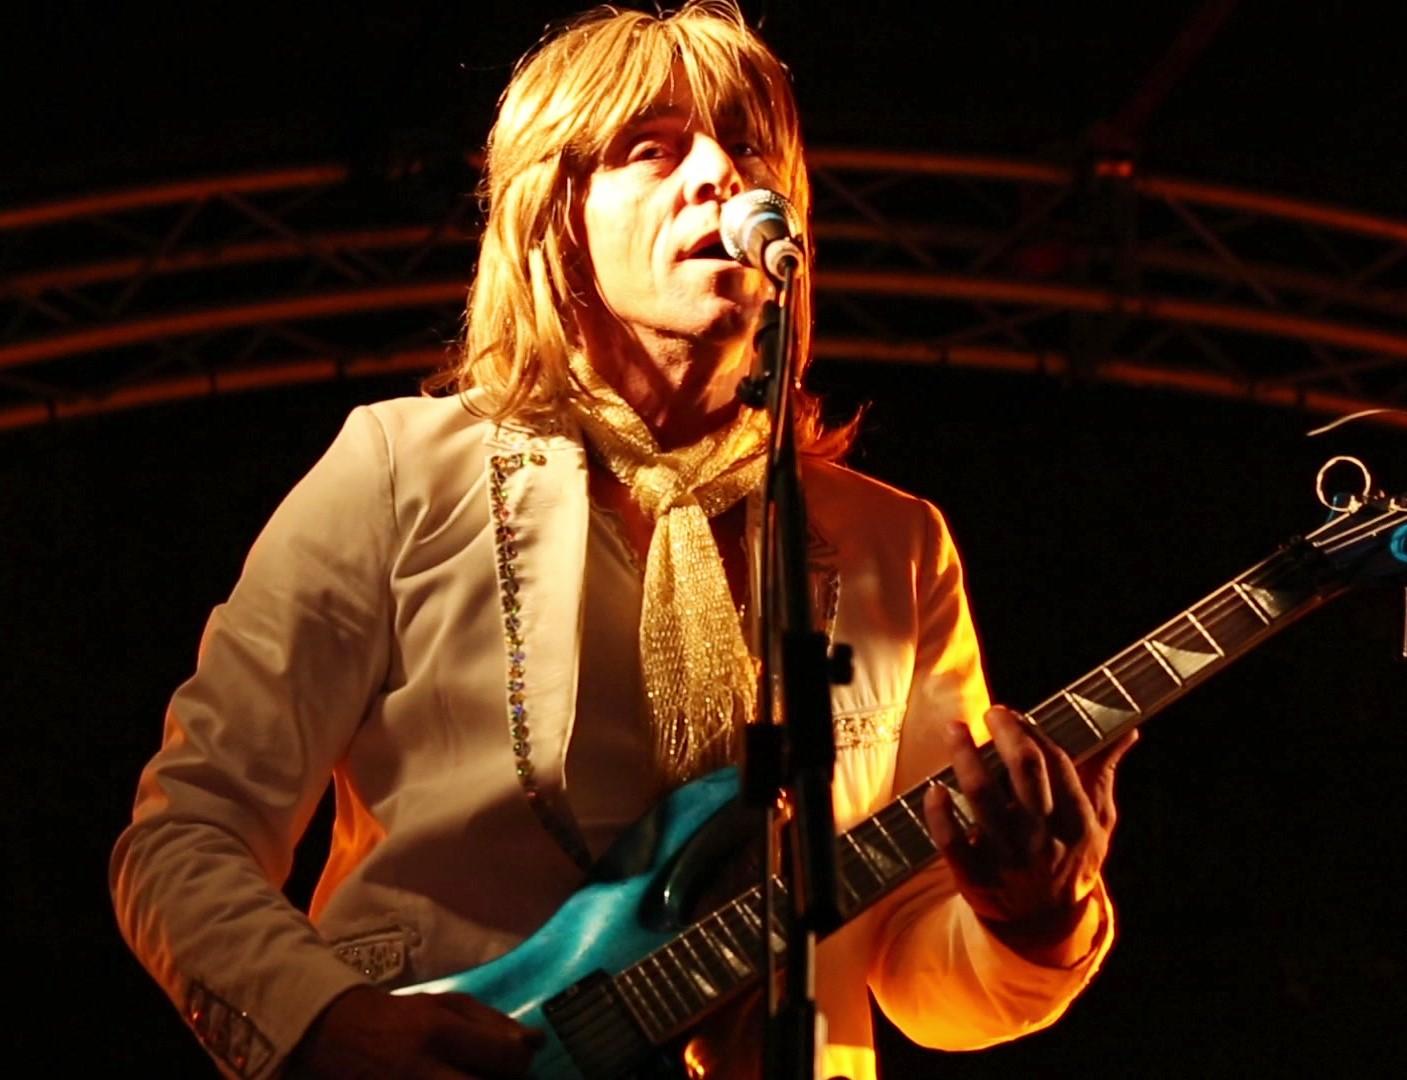 ABBA Chique guitarist